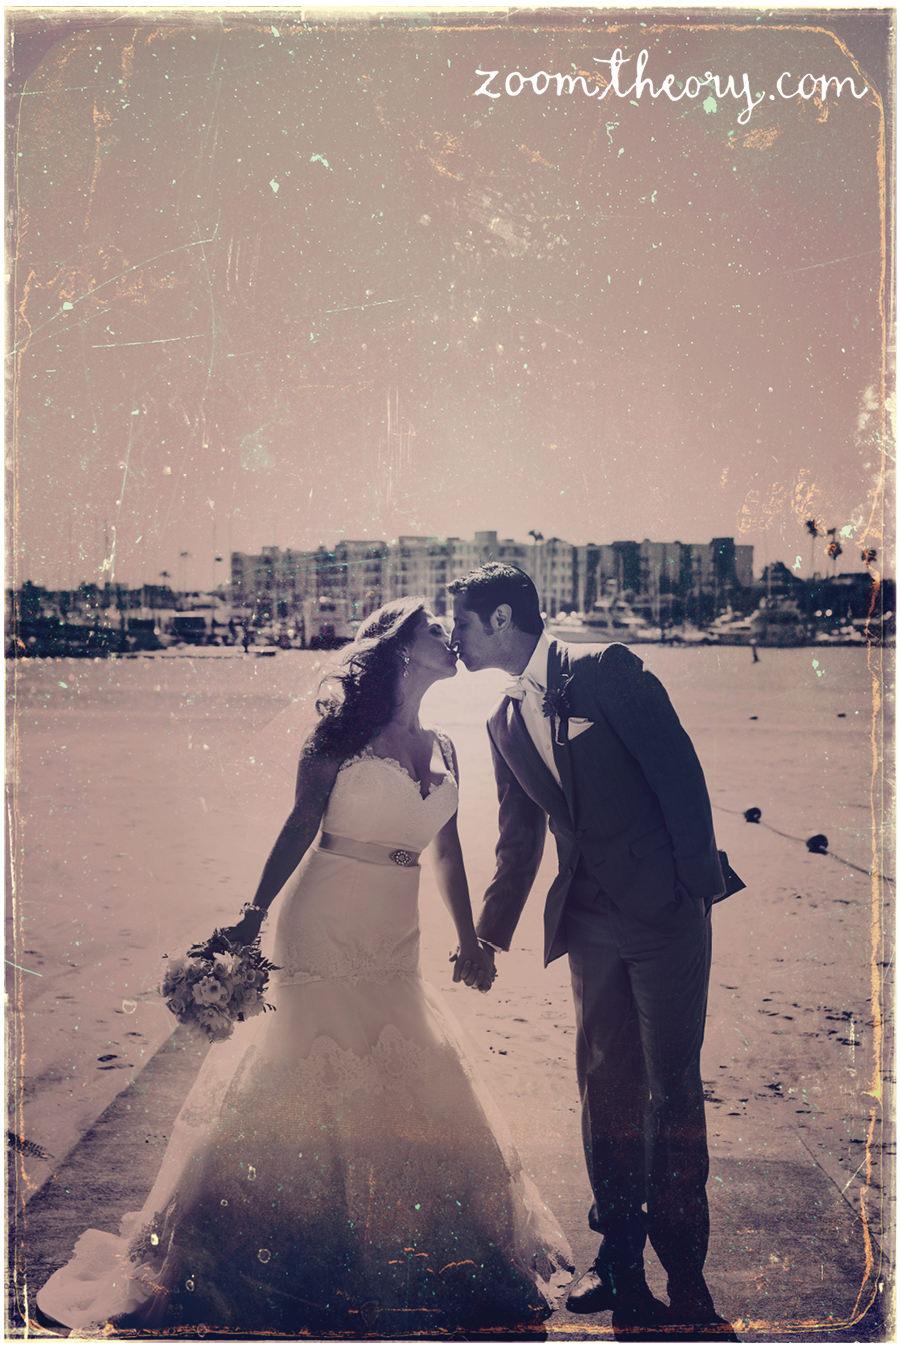 jewish fantasea yatchs marina del rey wedding 4